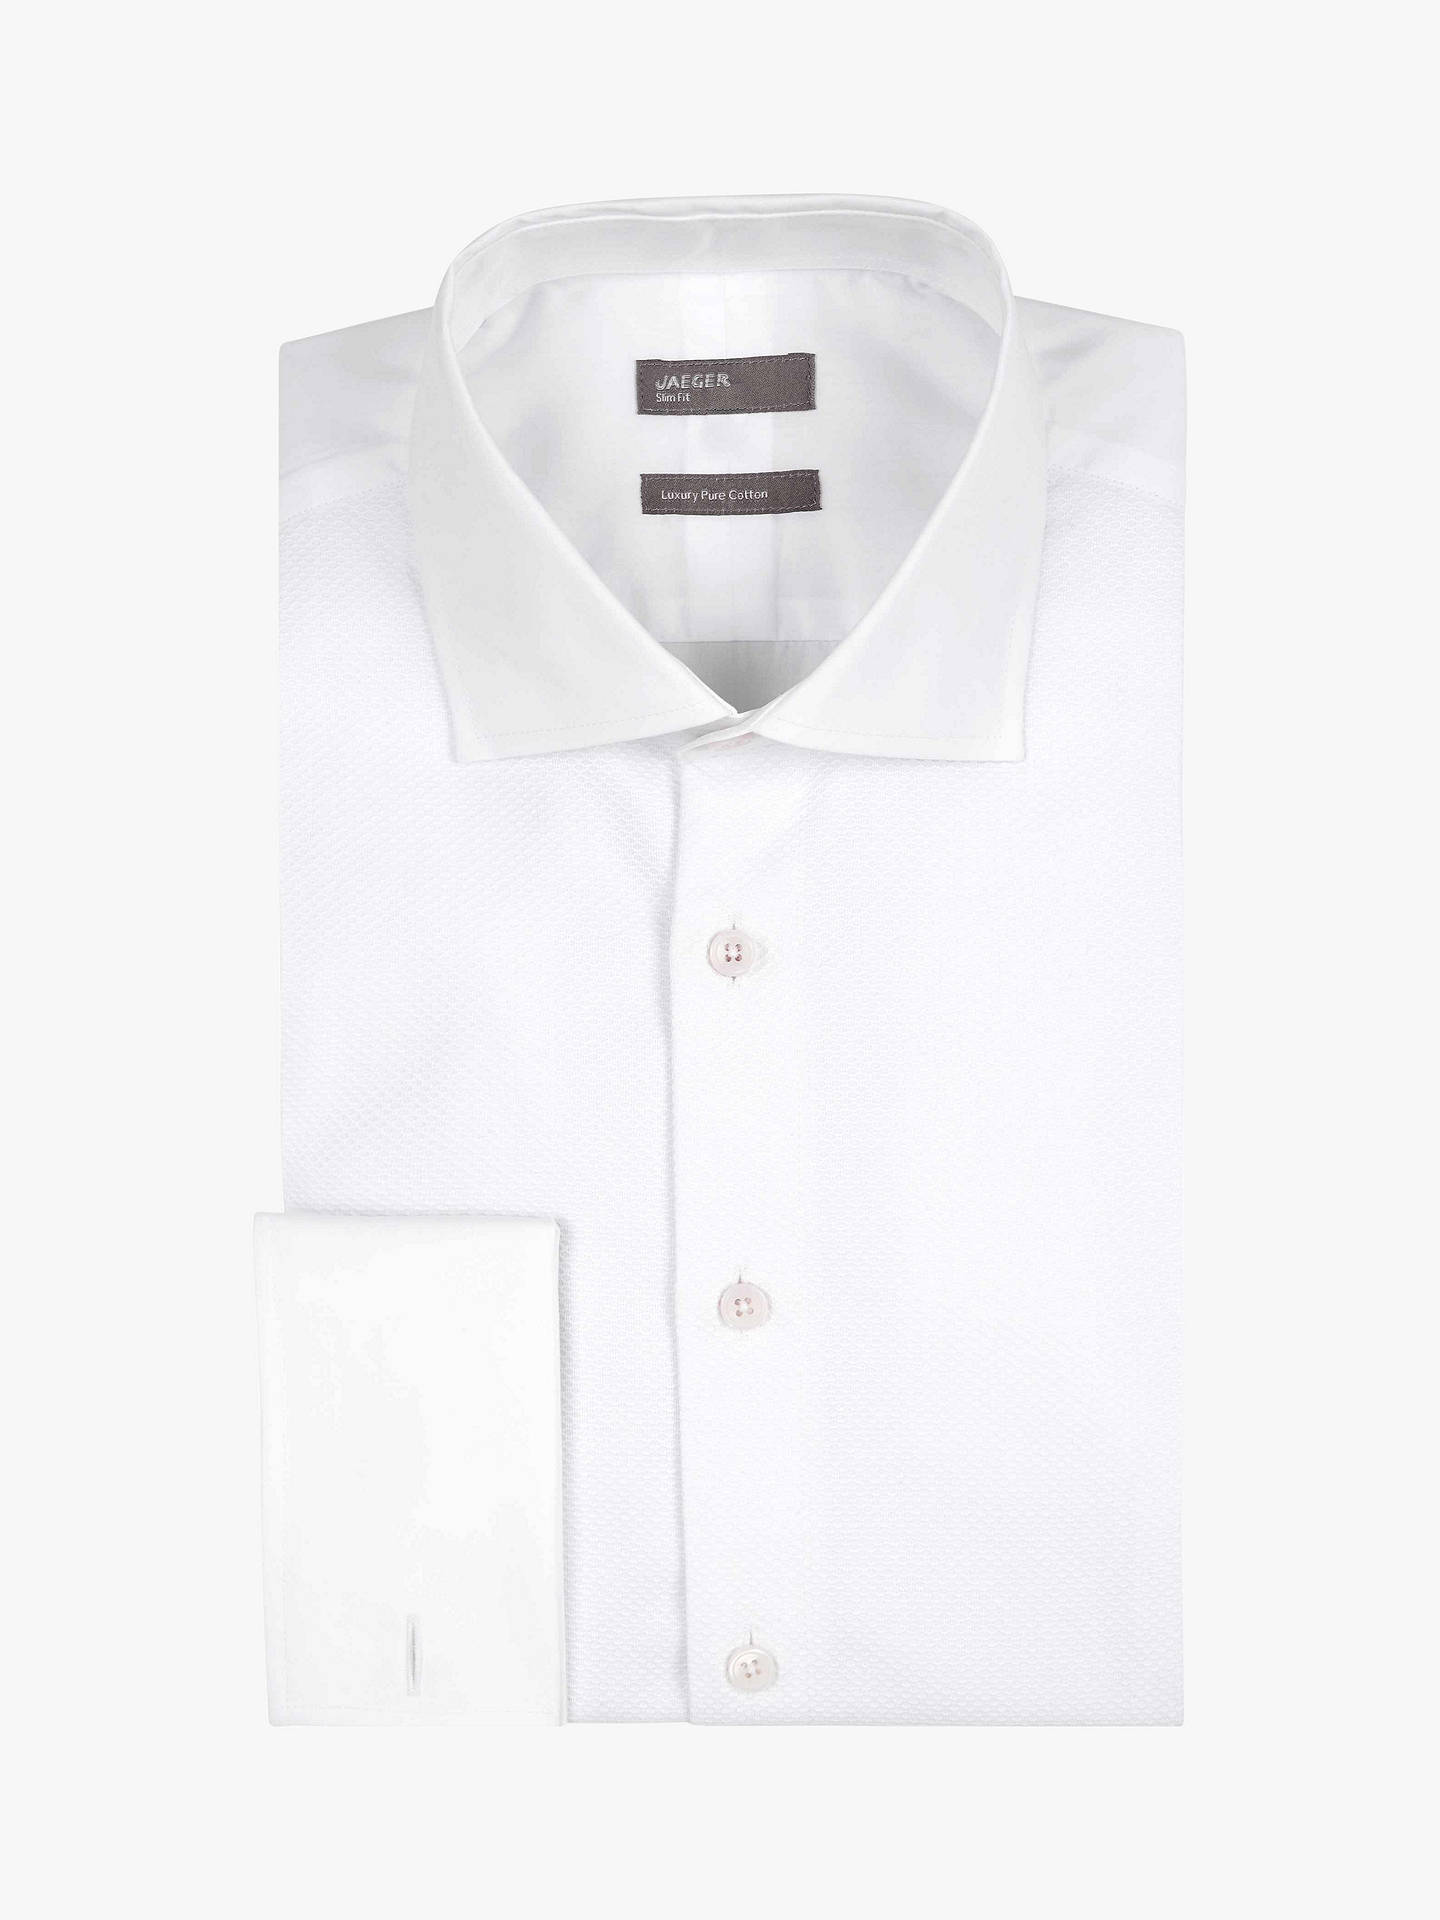 0405a9c29c5 Buy Jaeger Marcella Formal Bib Shirt